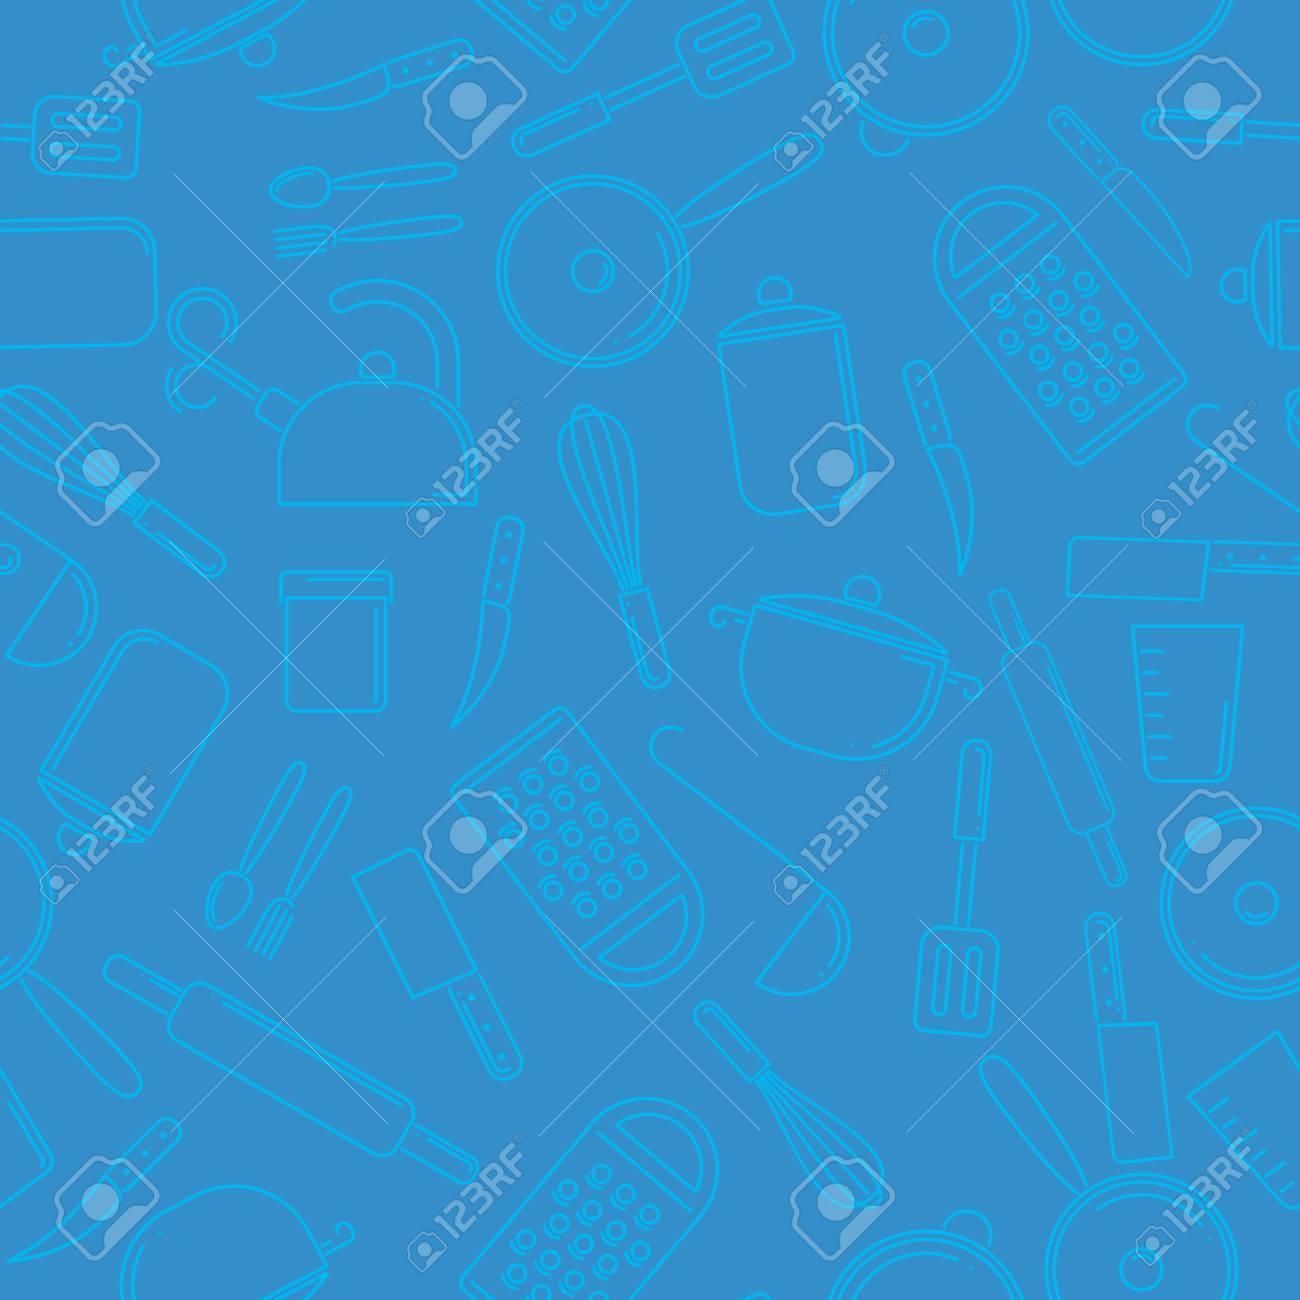 8ab4e6e7e Foto de archivo - Patrón sin fisuras de coloridos utensilios de cocina  sobre fondo azul. Conjunto de herramientas de cocina.